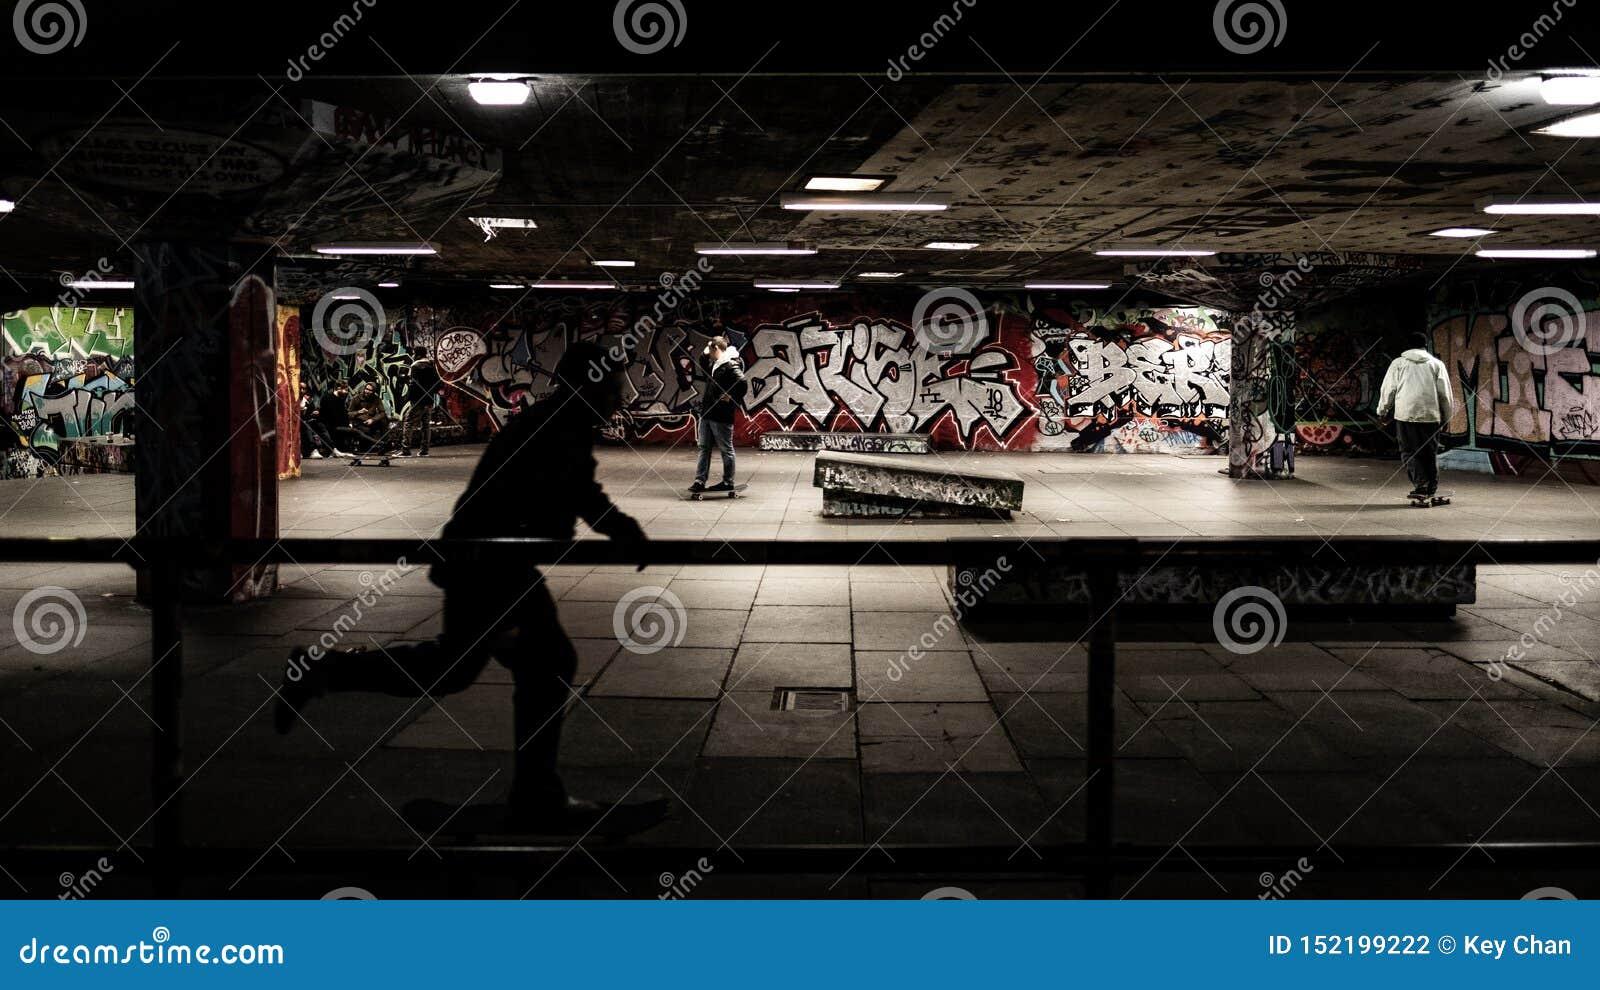 Skateboarding at the skatepark ,black shadow